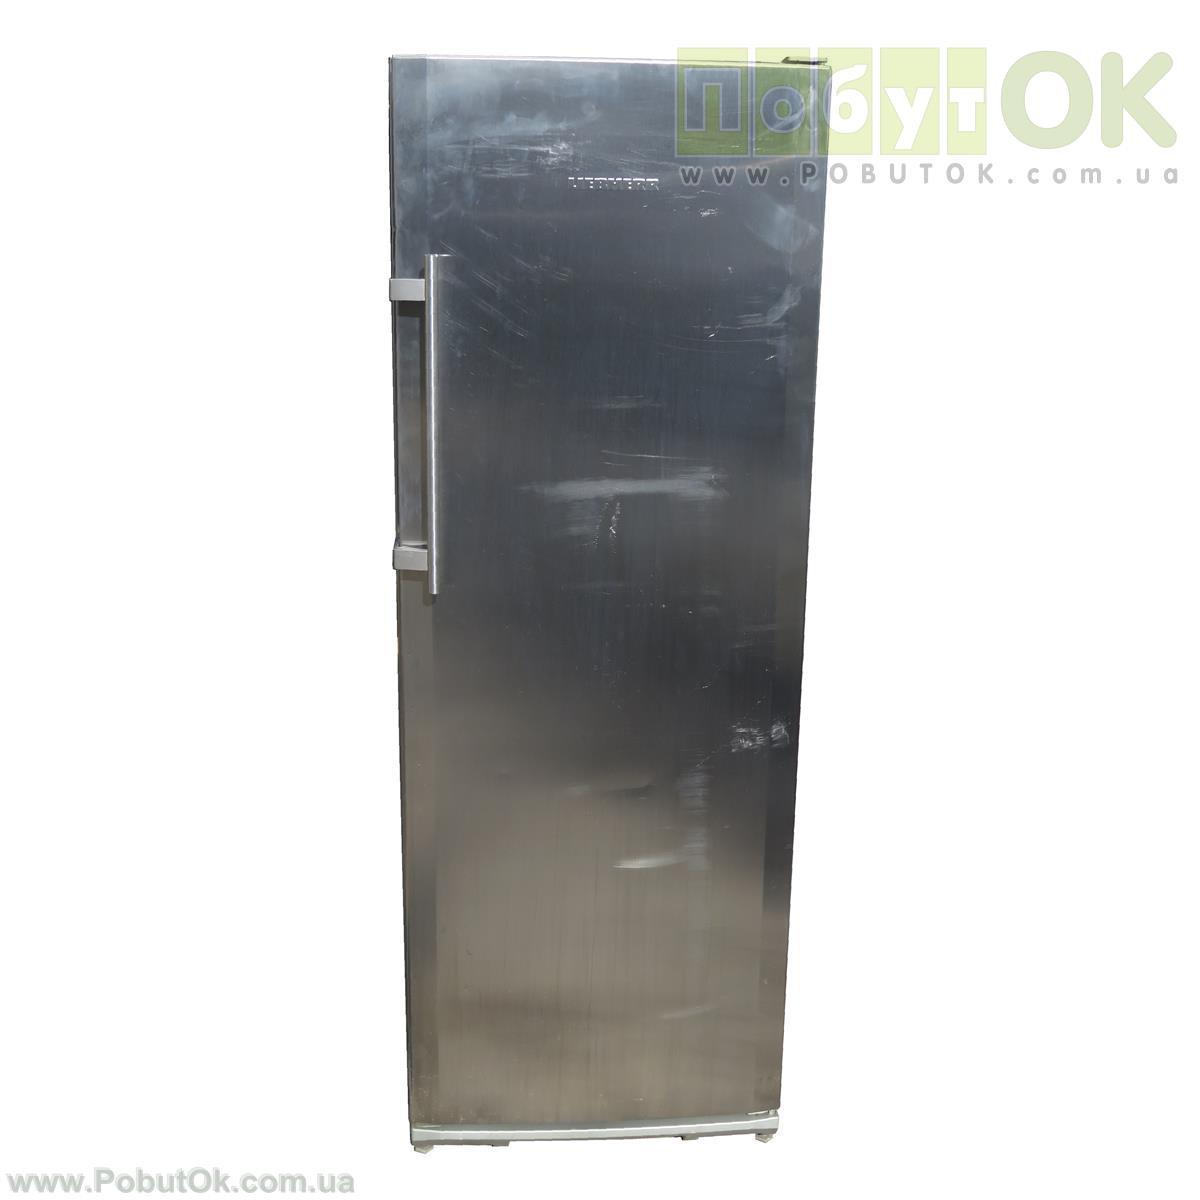 Холодильник LIEBHERR Kbes 3650 Index 20B / 001 (Код:0860) Состояние: Б/У